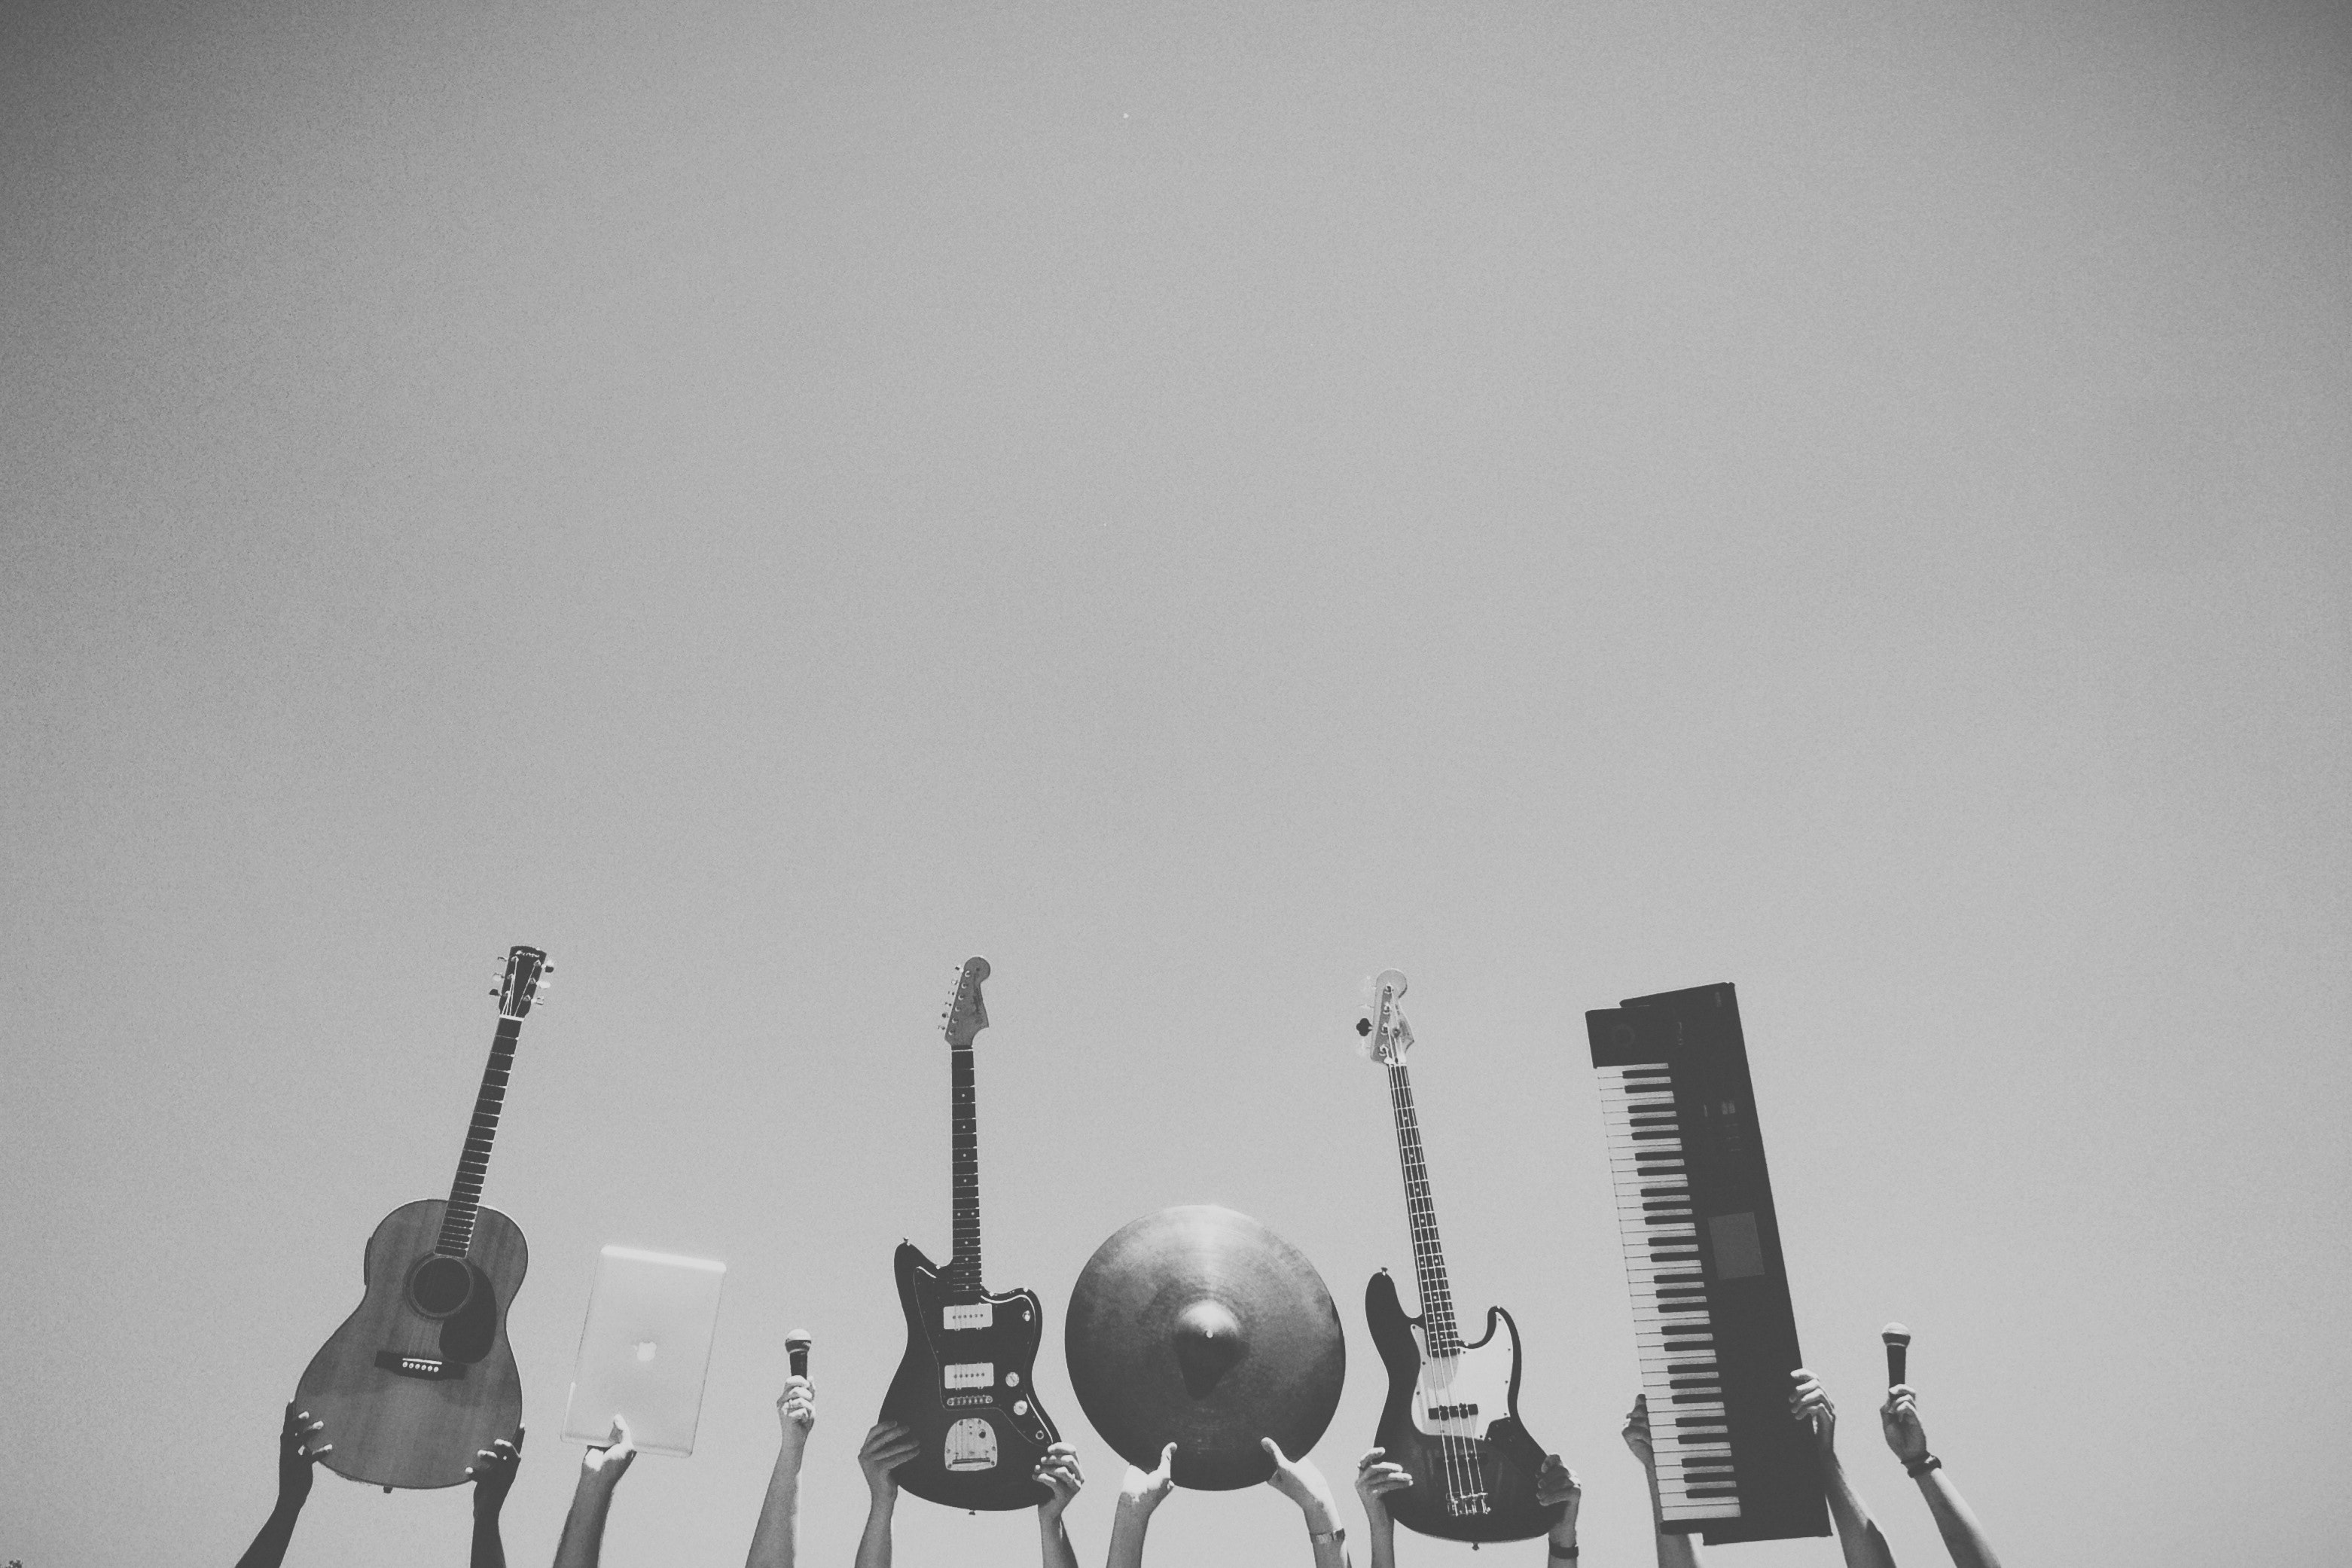 101+ Gambar Alat Musik Rock Terbaik